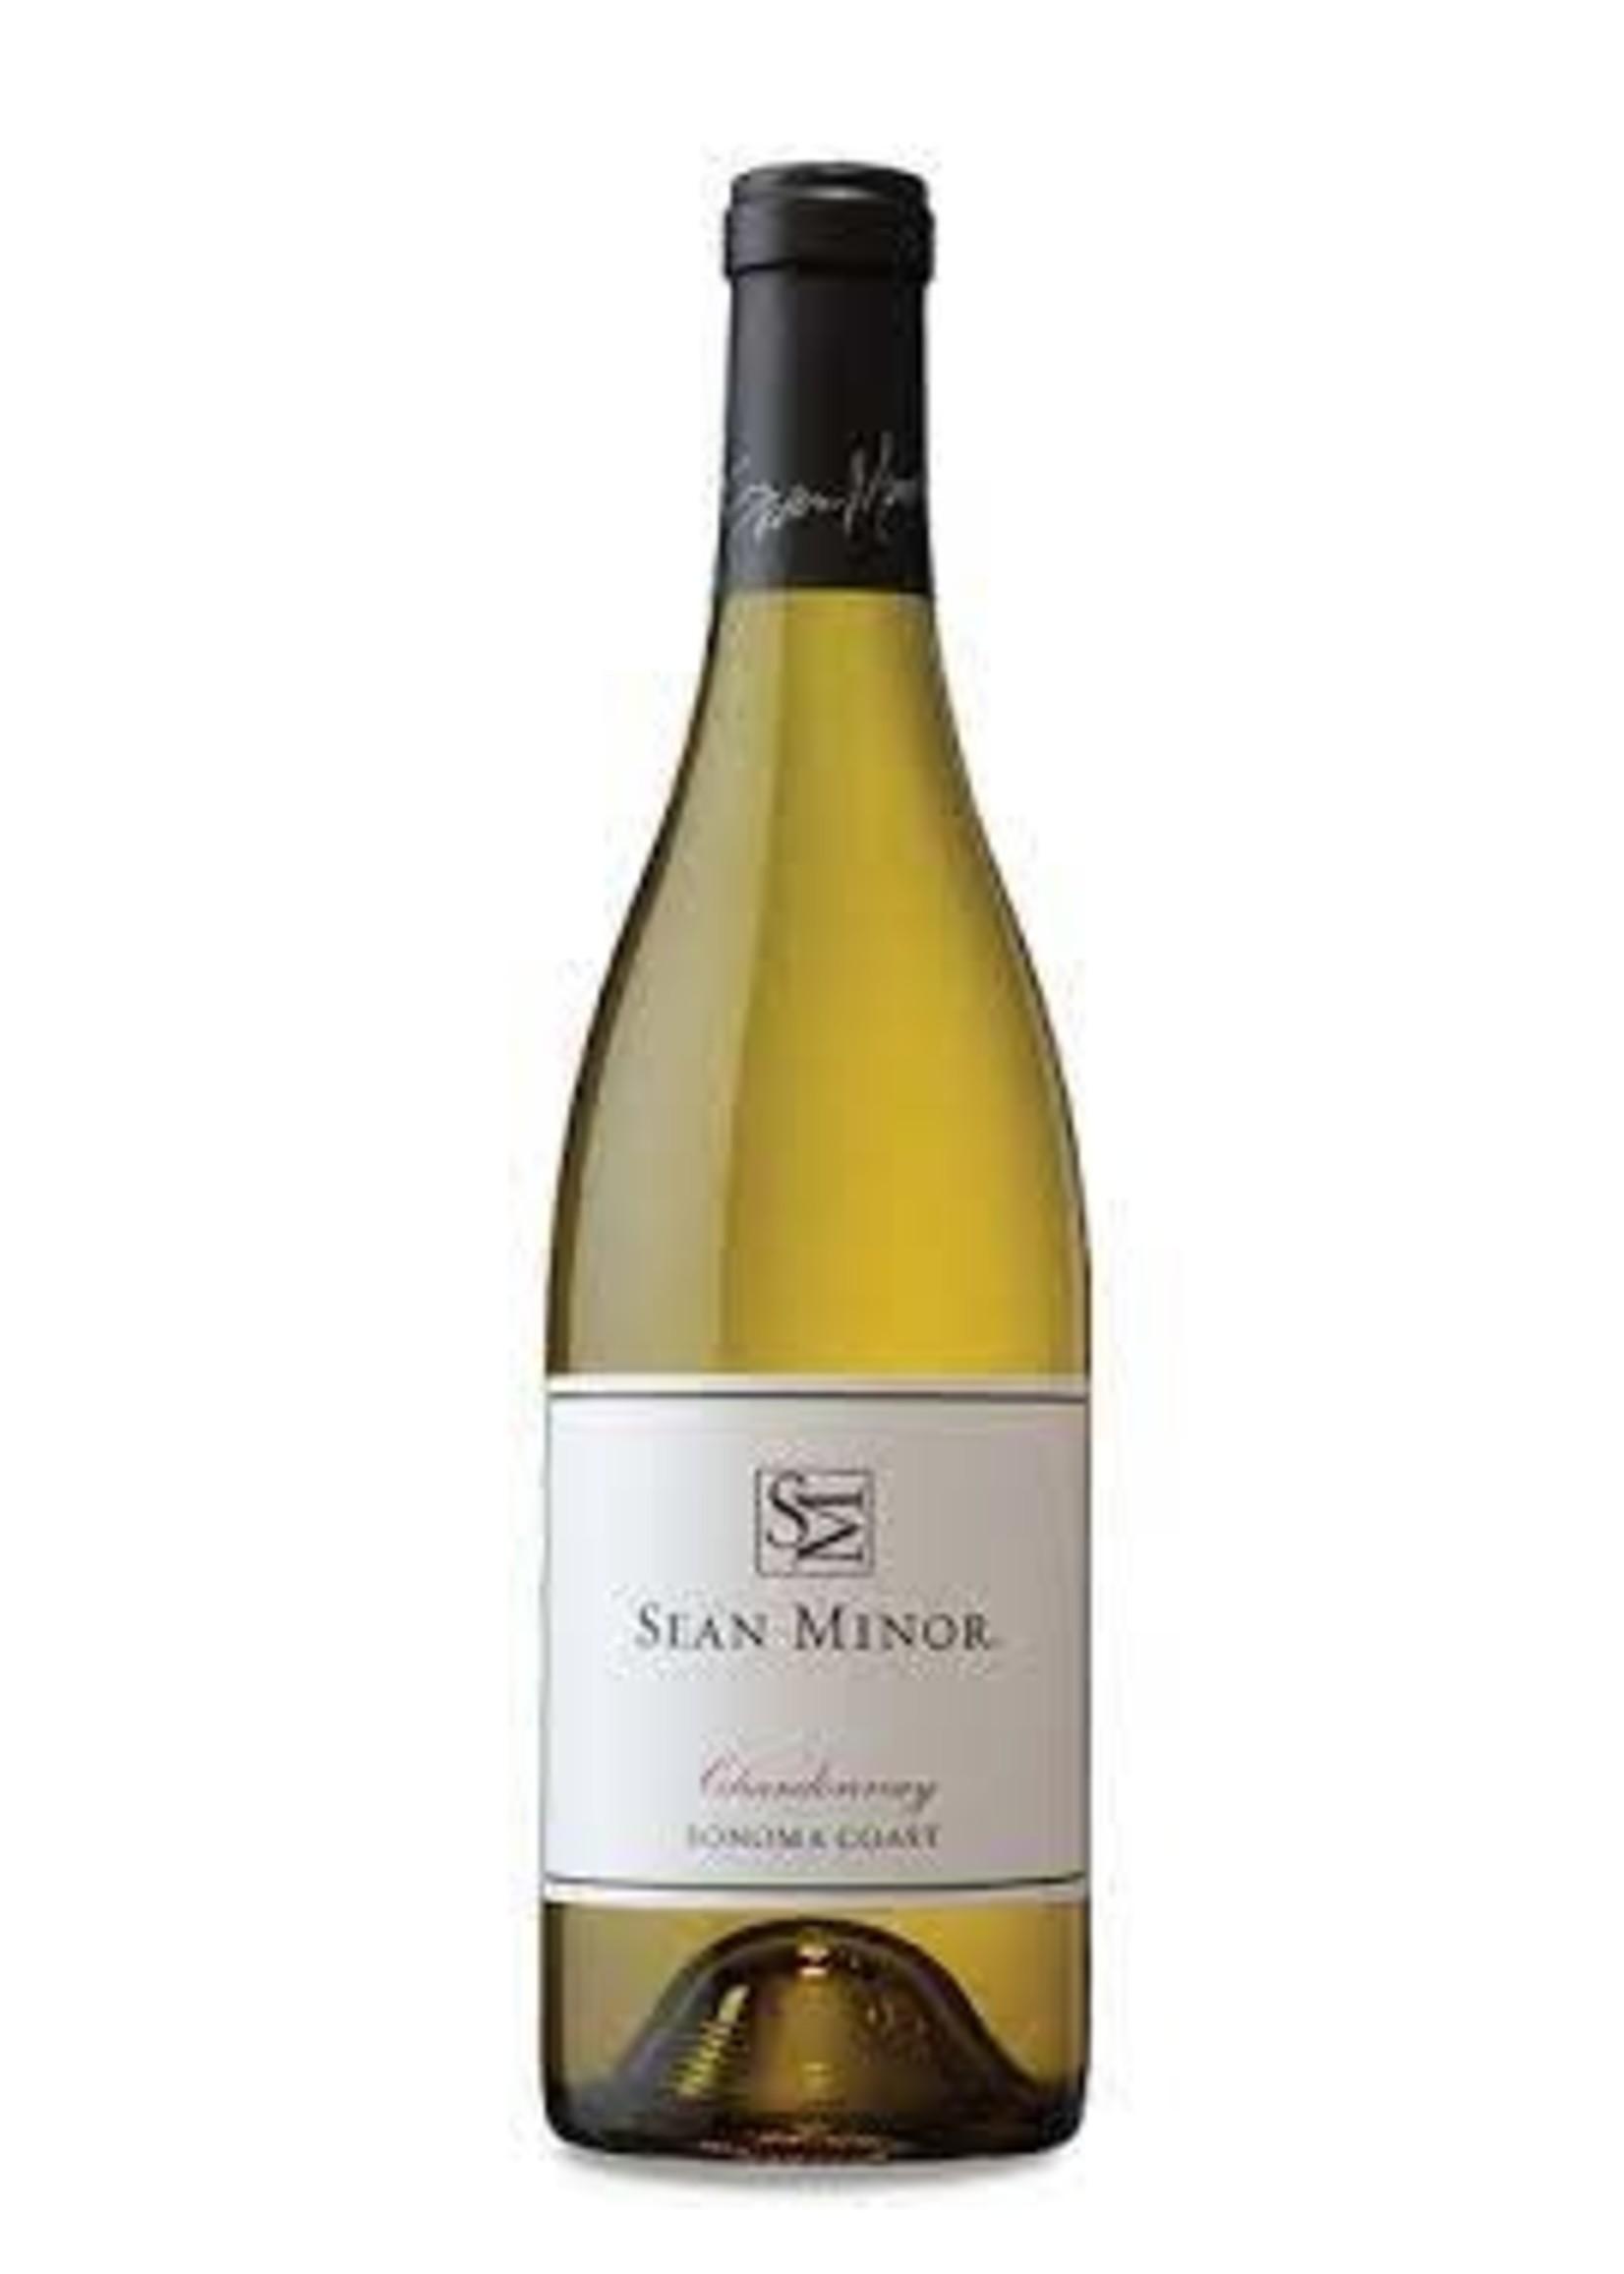 Sean Minor 2018 Chardonnay Sonoma Coast 750ml